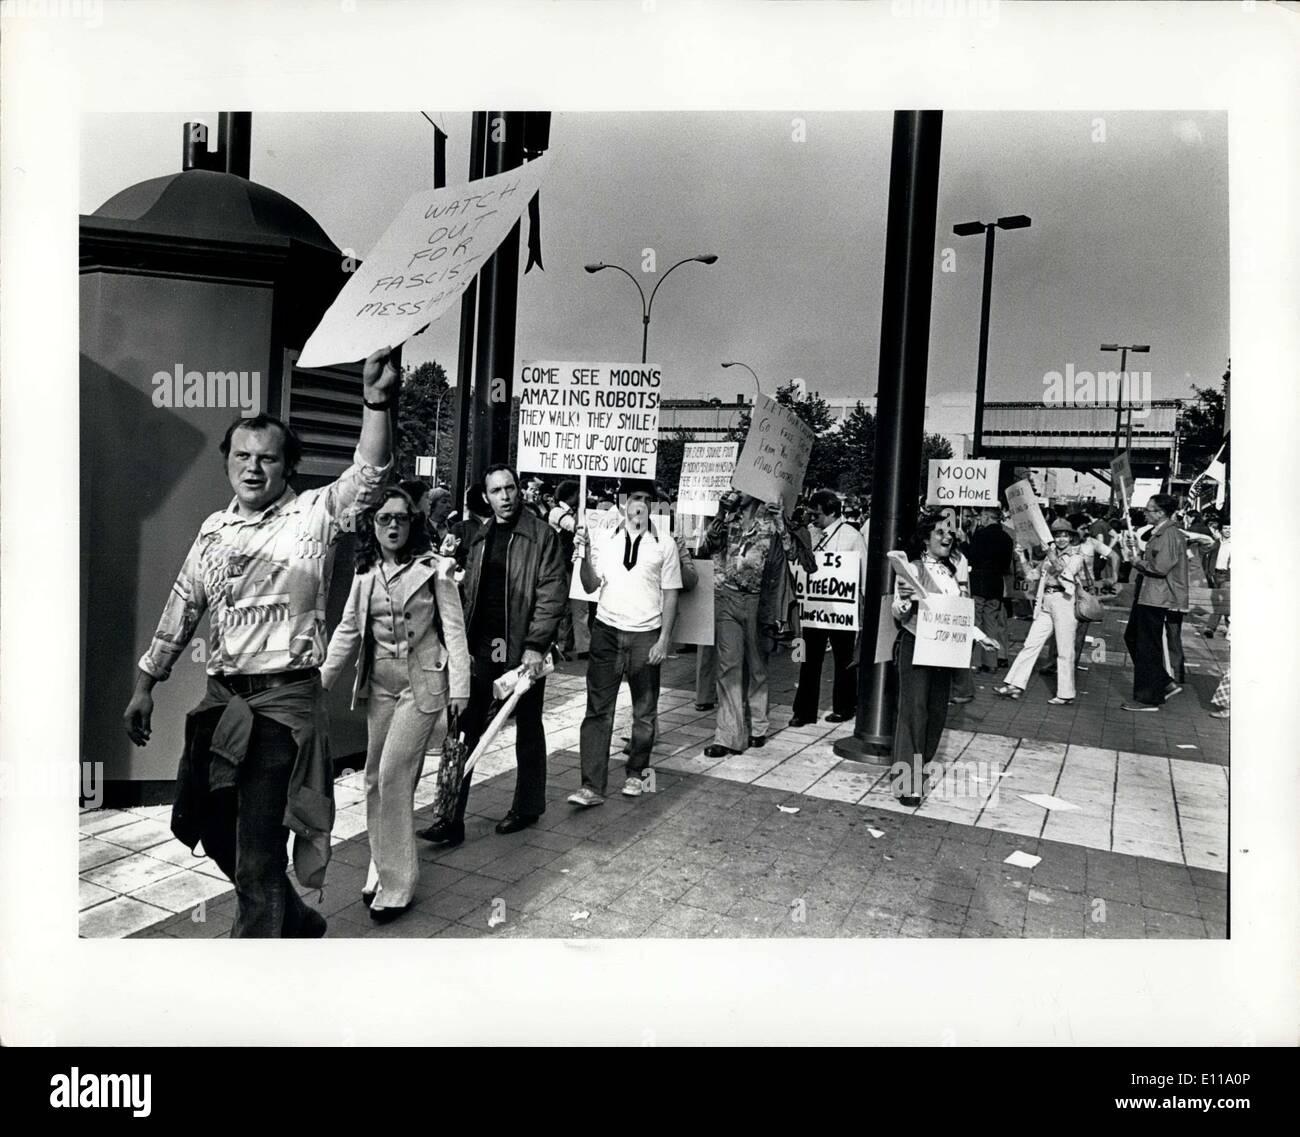 Jun. 01, 1976 - Demonstration against RW Moon's Unification church Yankee Stadium. - Stock Image